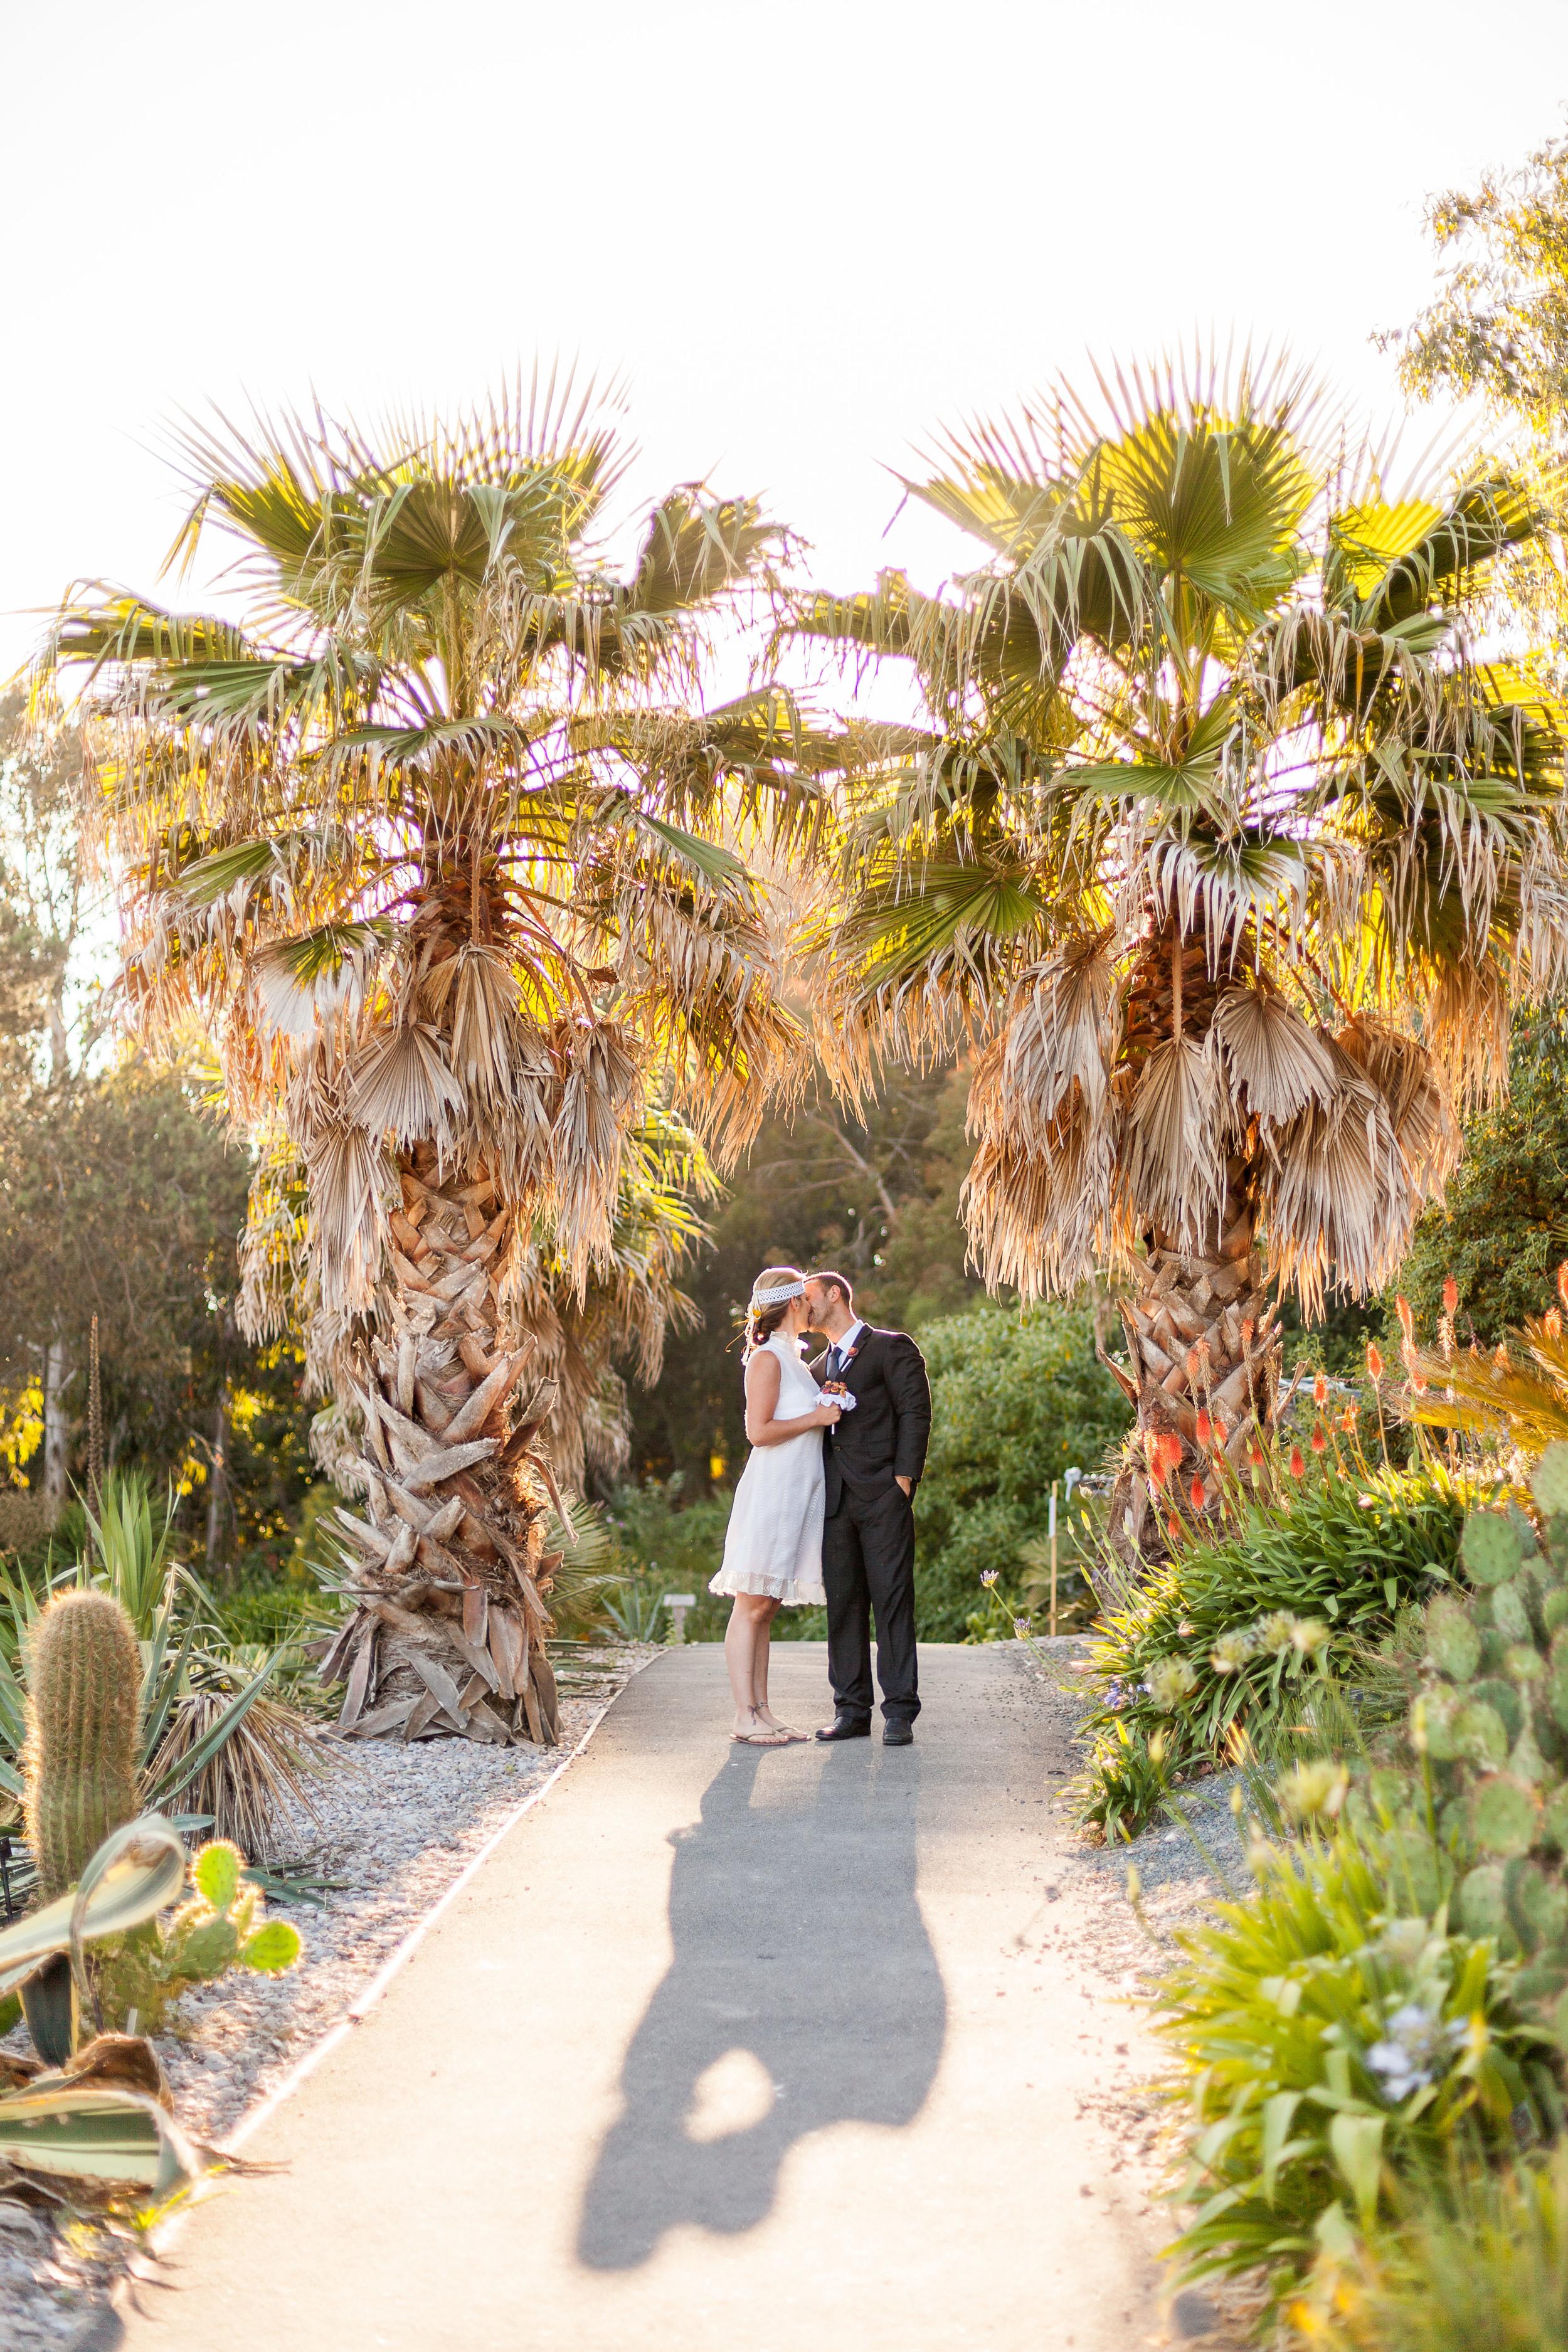 ethical-wedding-VBG-chris-cowley-207.jpg